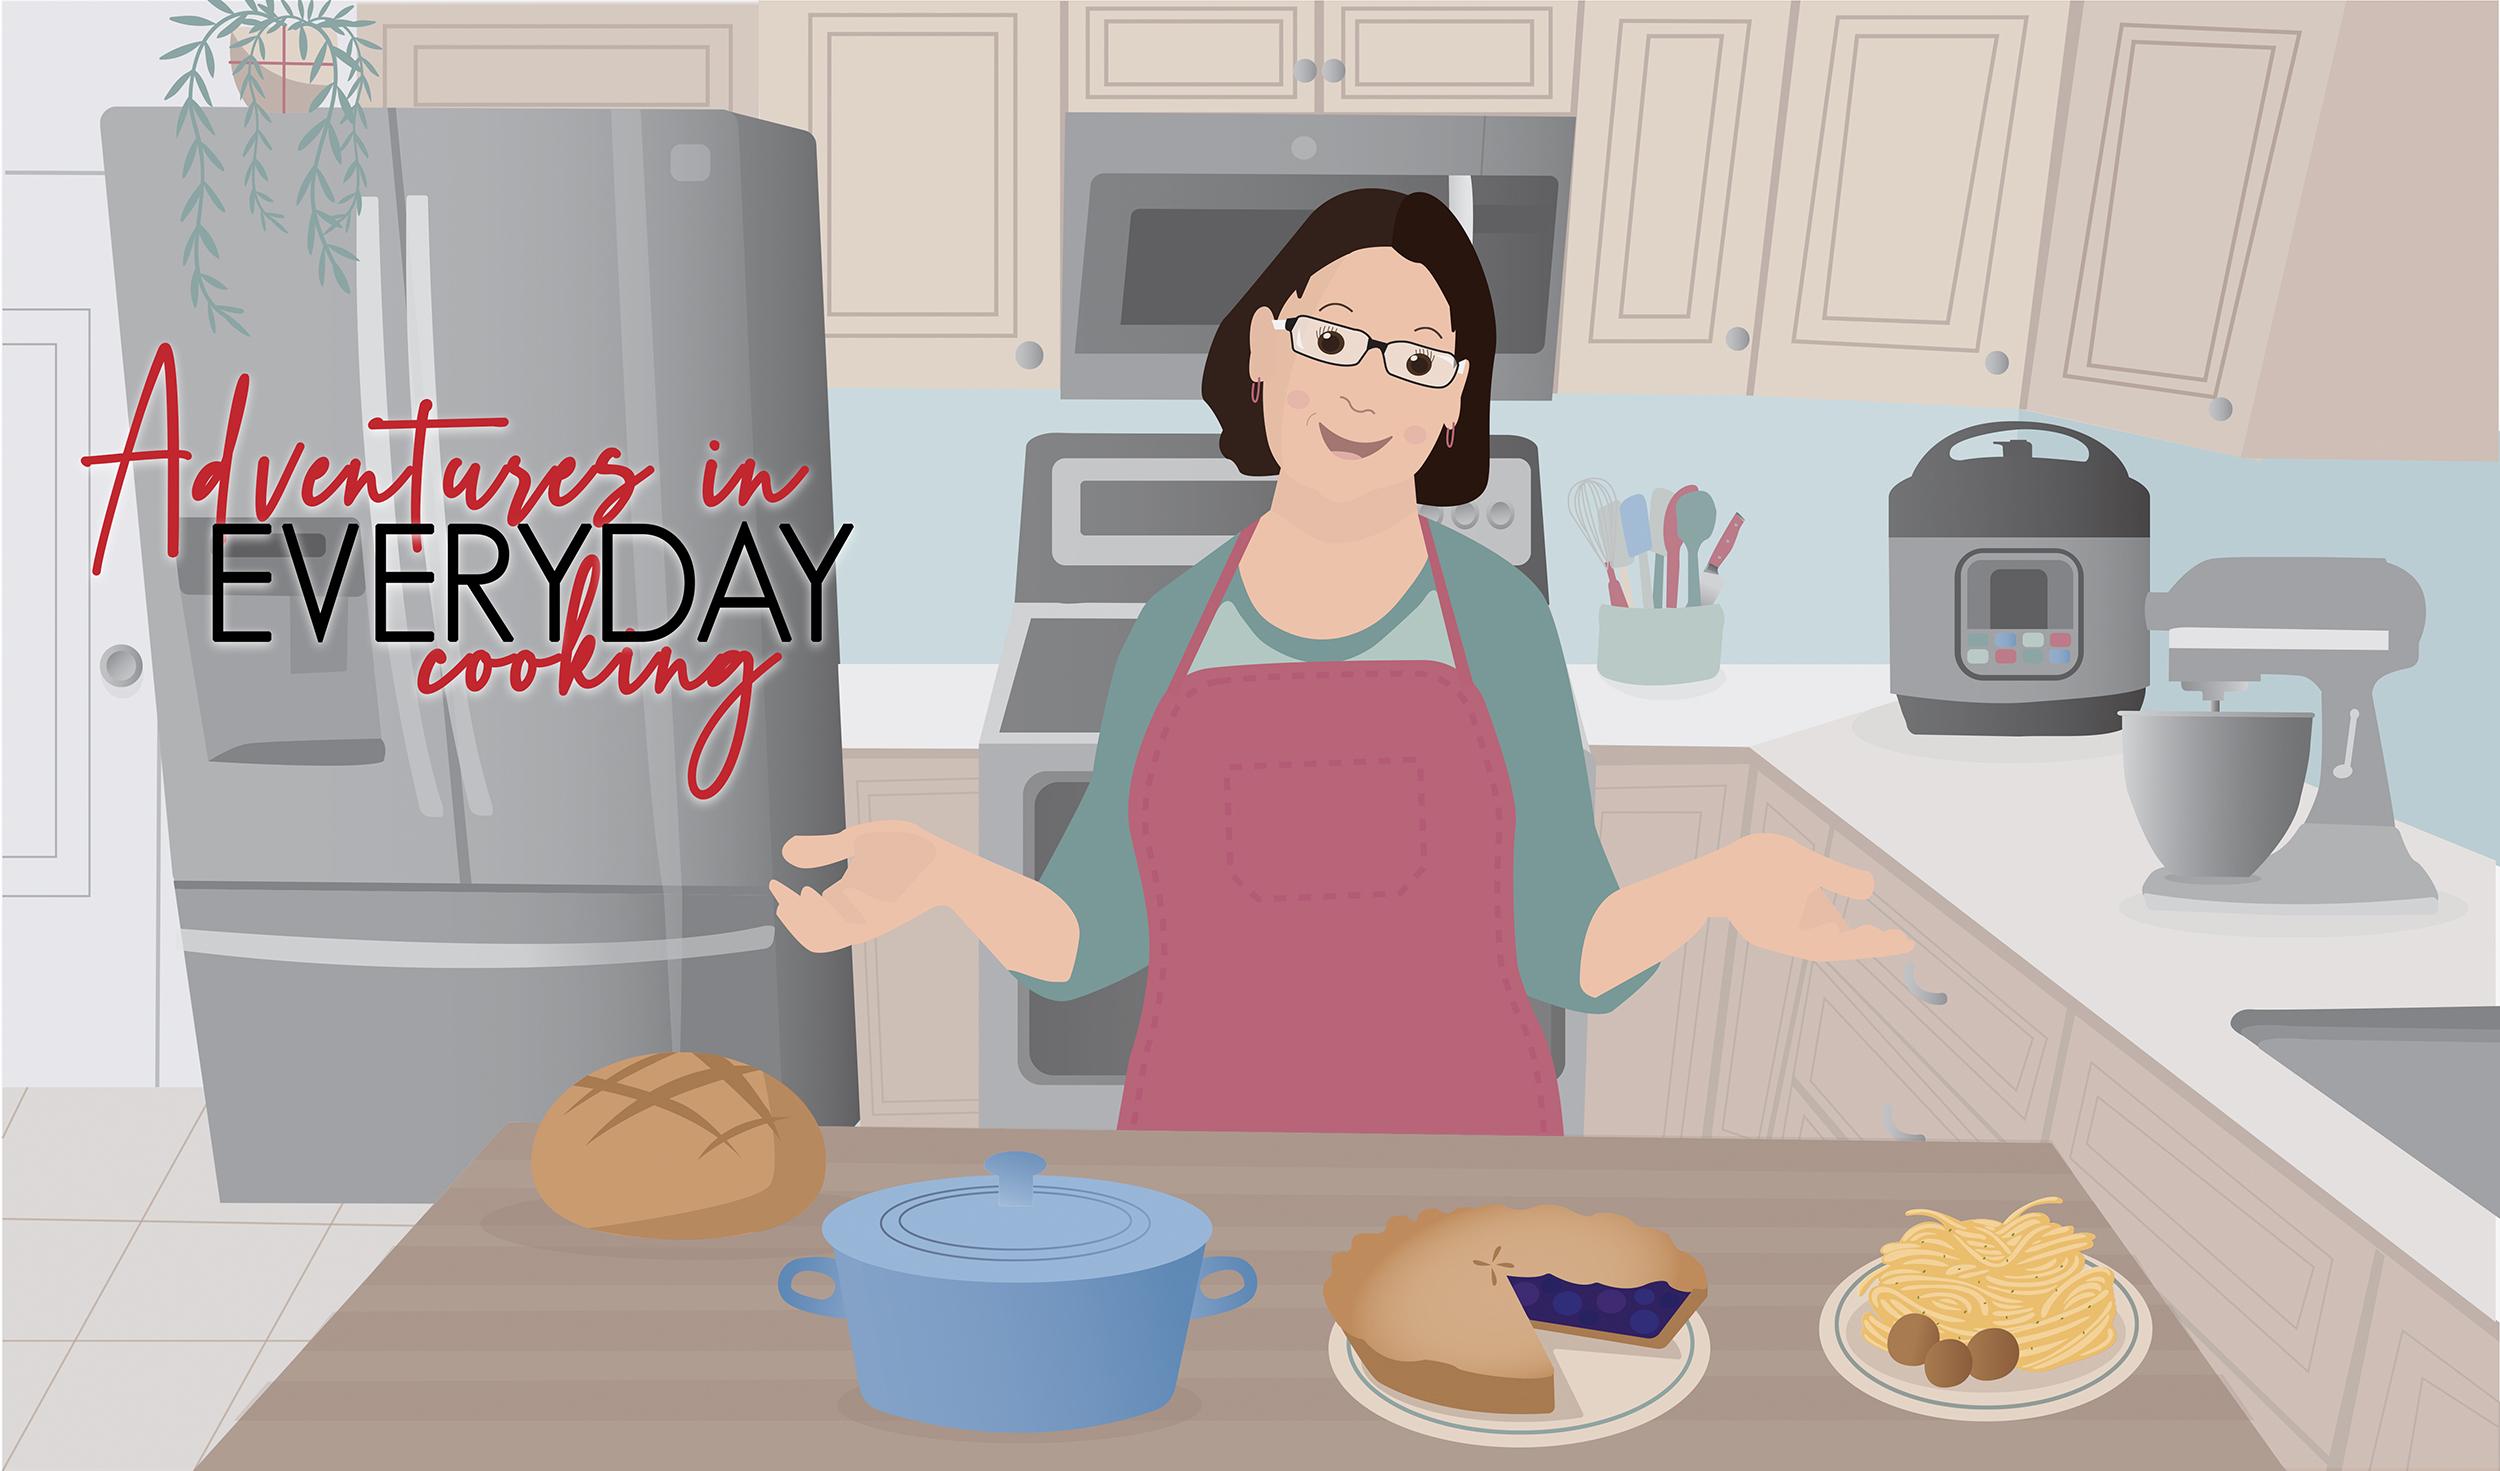 Adventures in Everyday Cooking